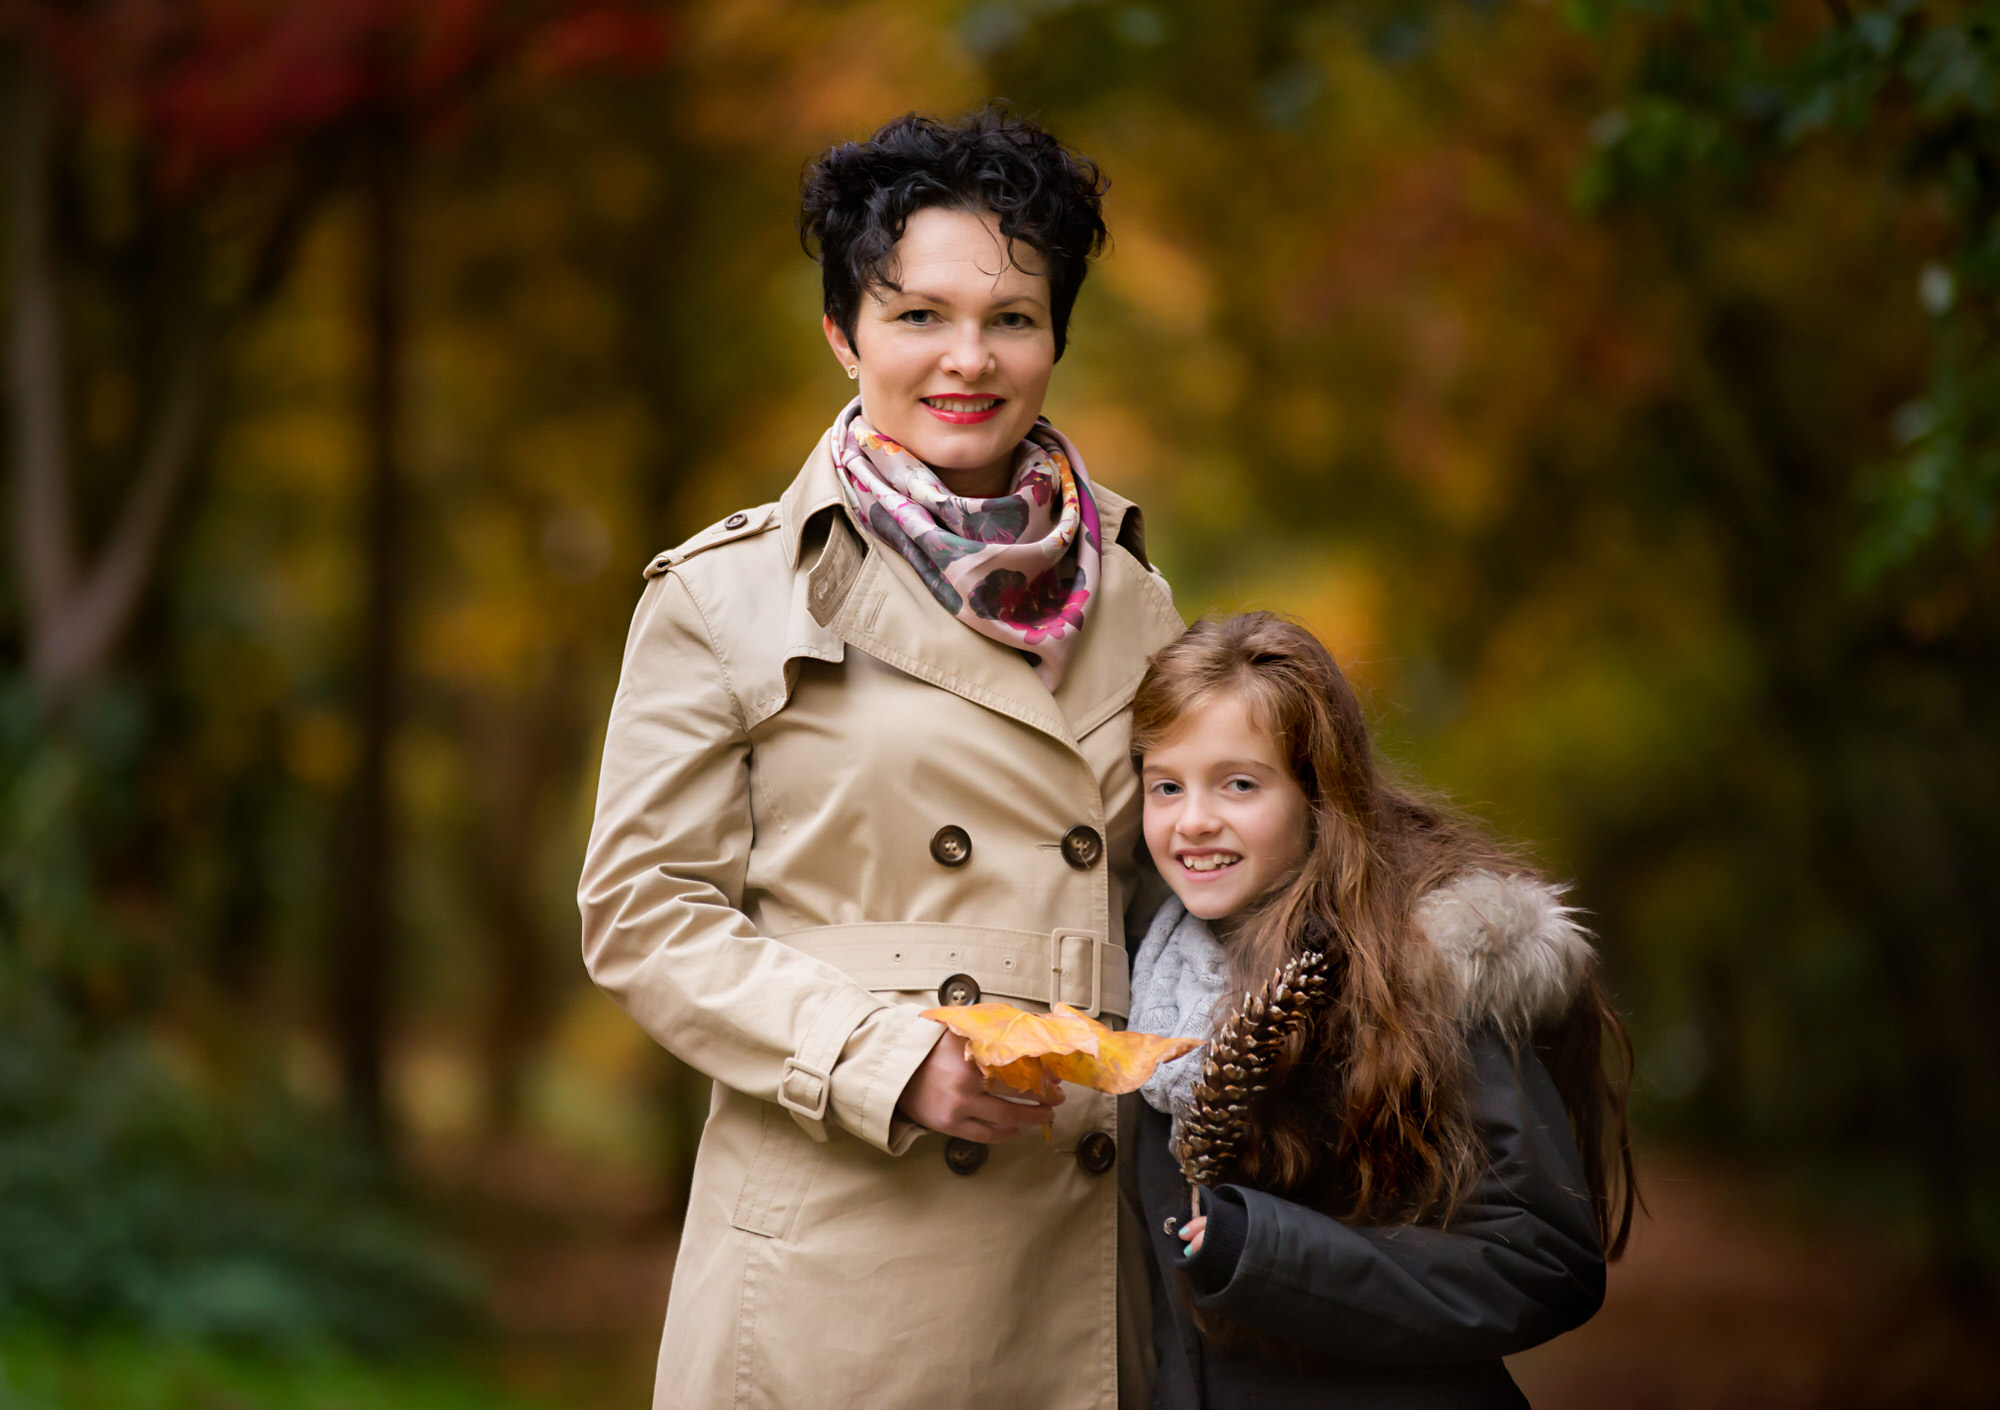 Family photographer in Barnsley, outdoor photoshoot